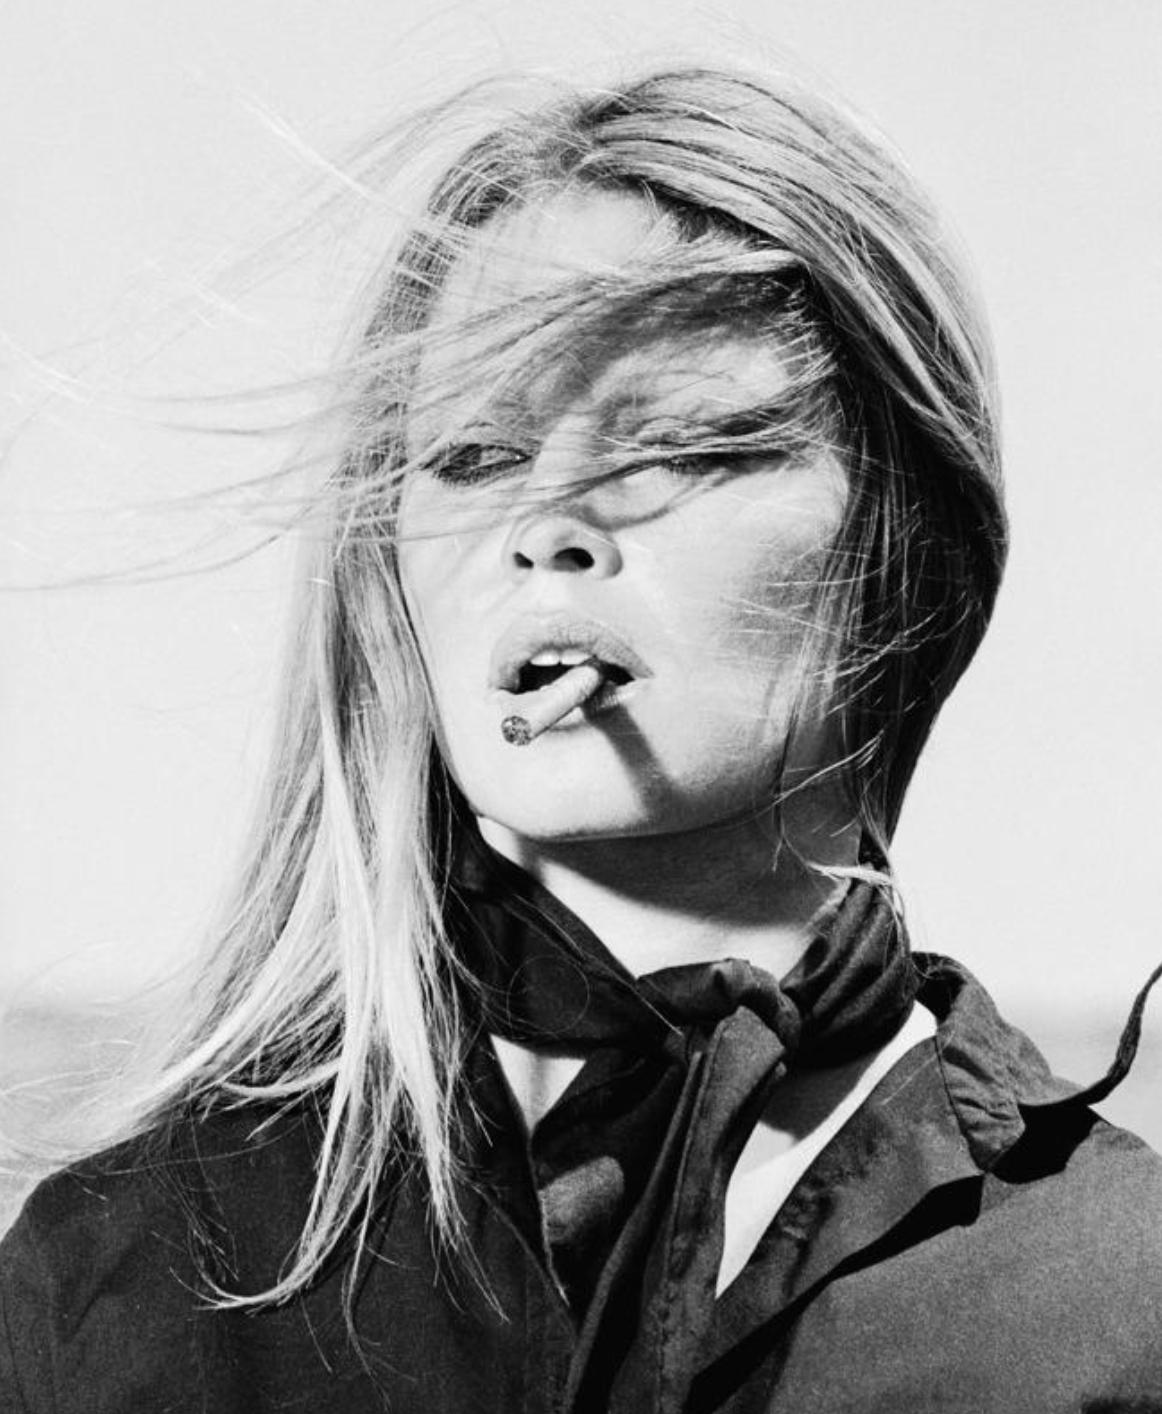 Print of Brigitte Bardot from the set Les Petroleuses (1971)